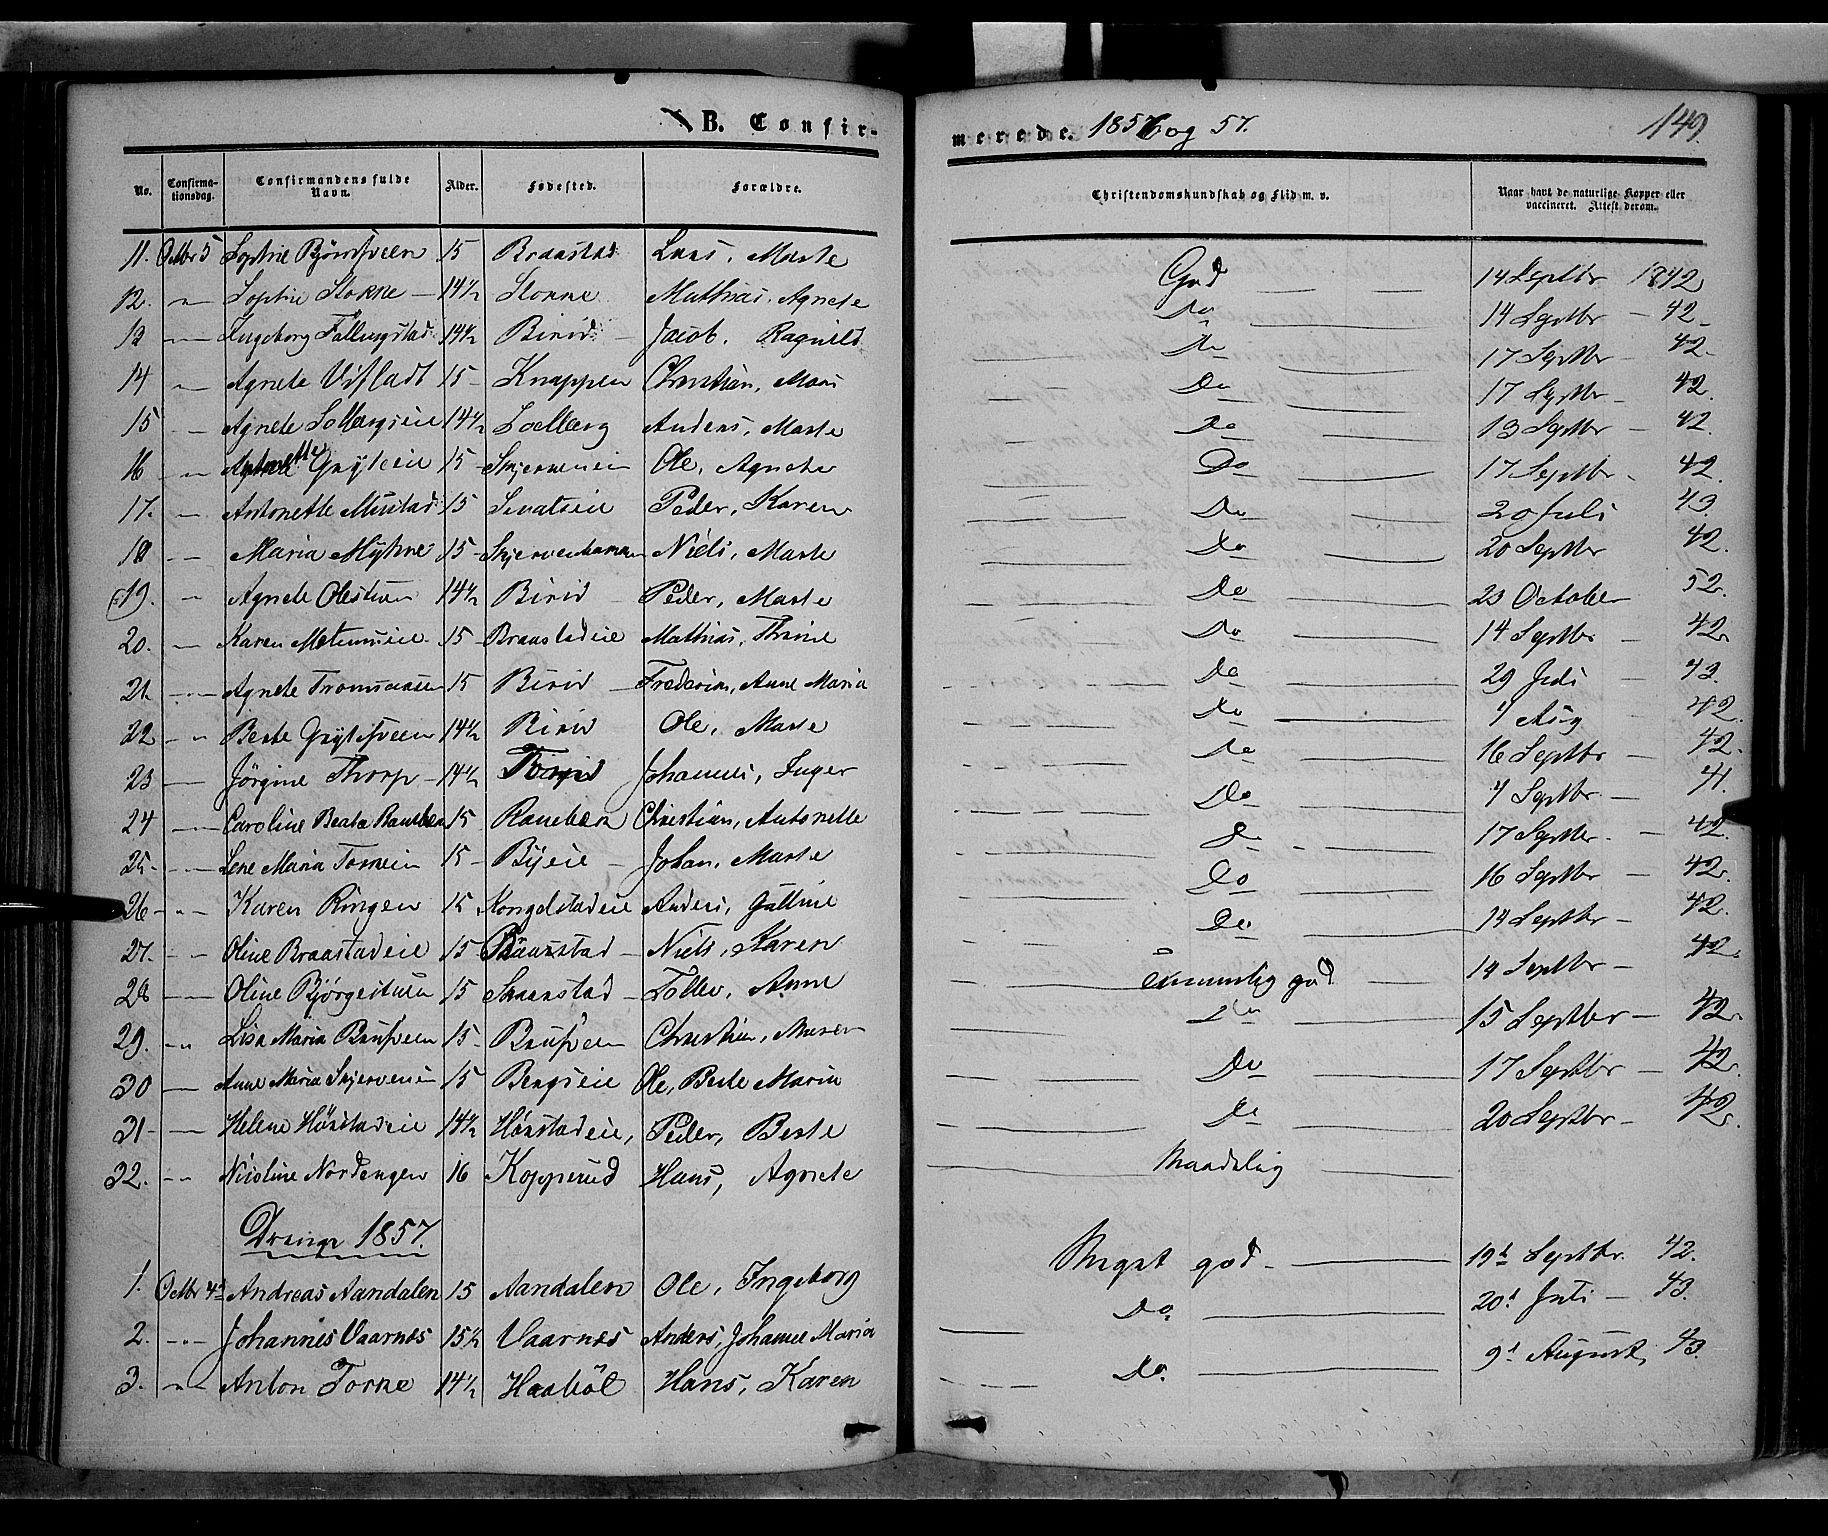 SAH, Vardal prestekontor, H/Ha/Haa/L0006: Ministerialbok nr. 6, 1854-1866, s. 149